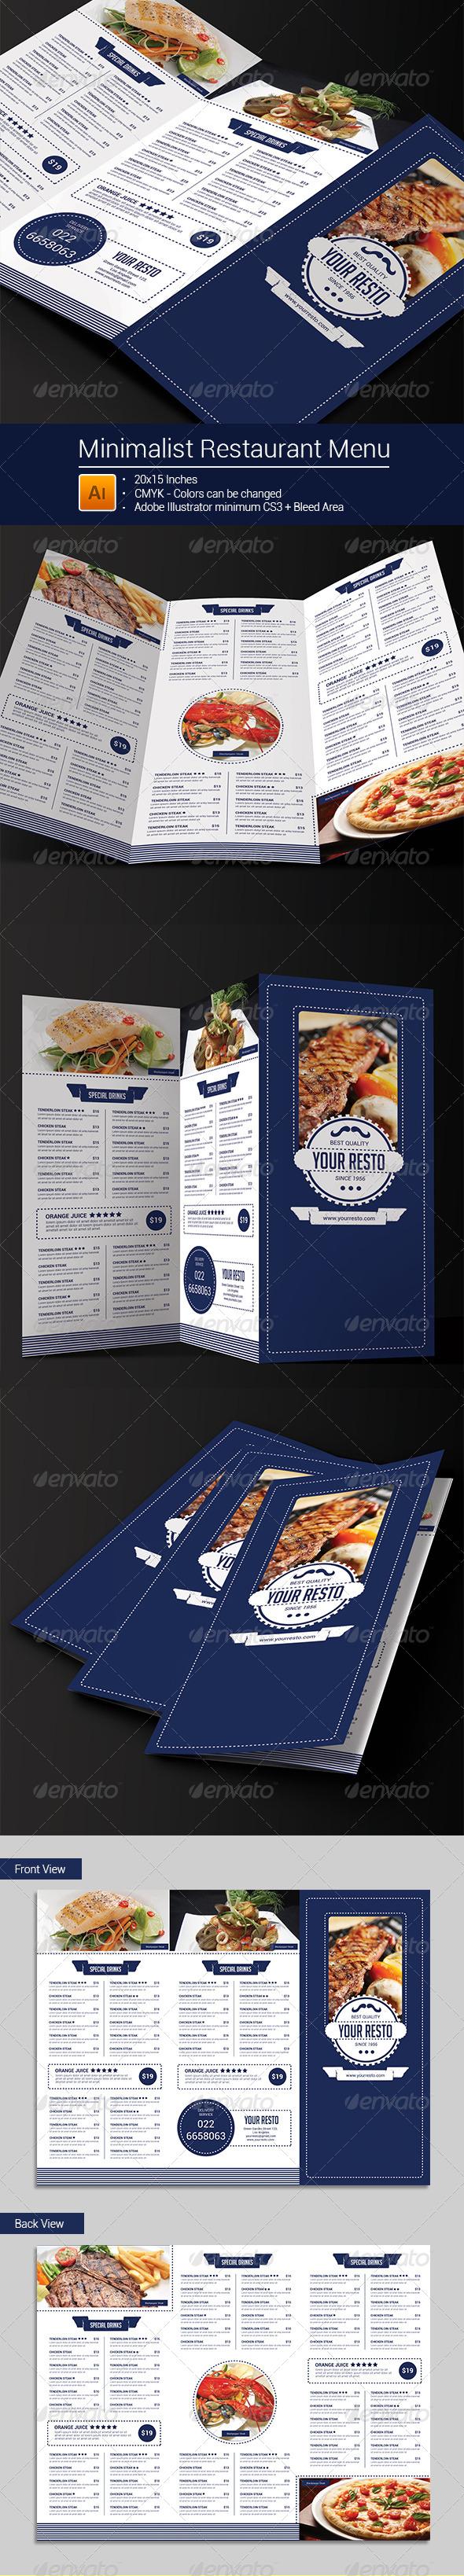 GraphicRiver Minimalist Trifold Restaurant Menu 8245216